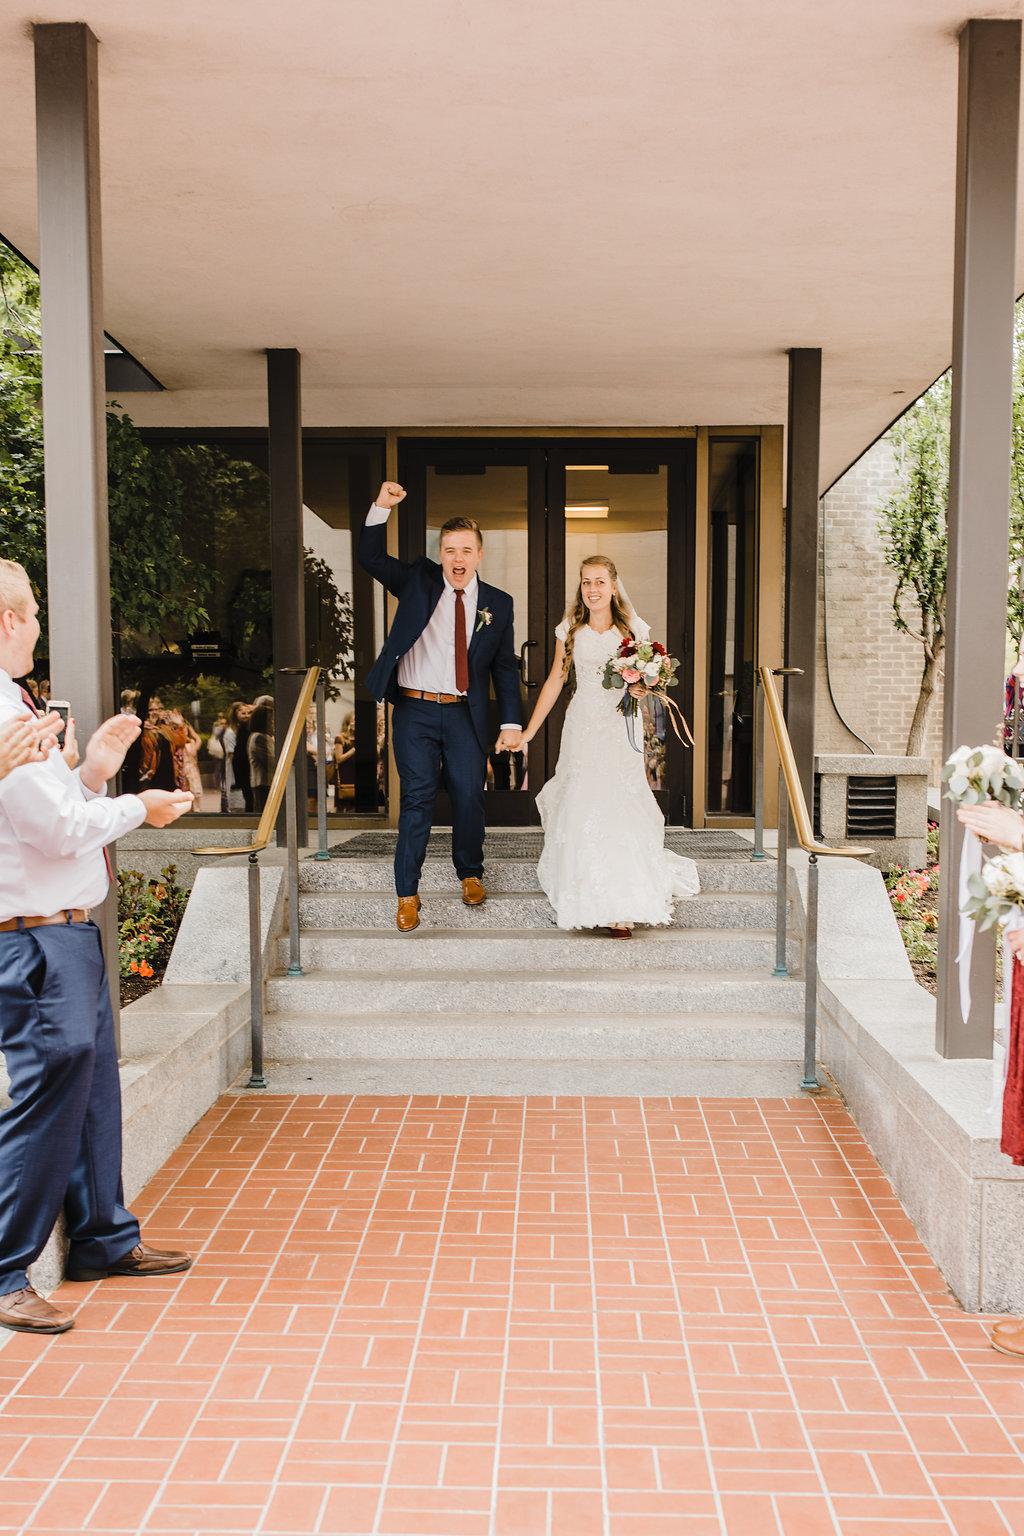 lds temple exit wedding photographer in salt lake city mormon wedding temple professional photography